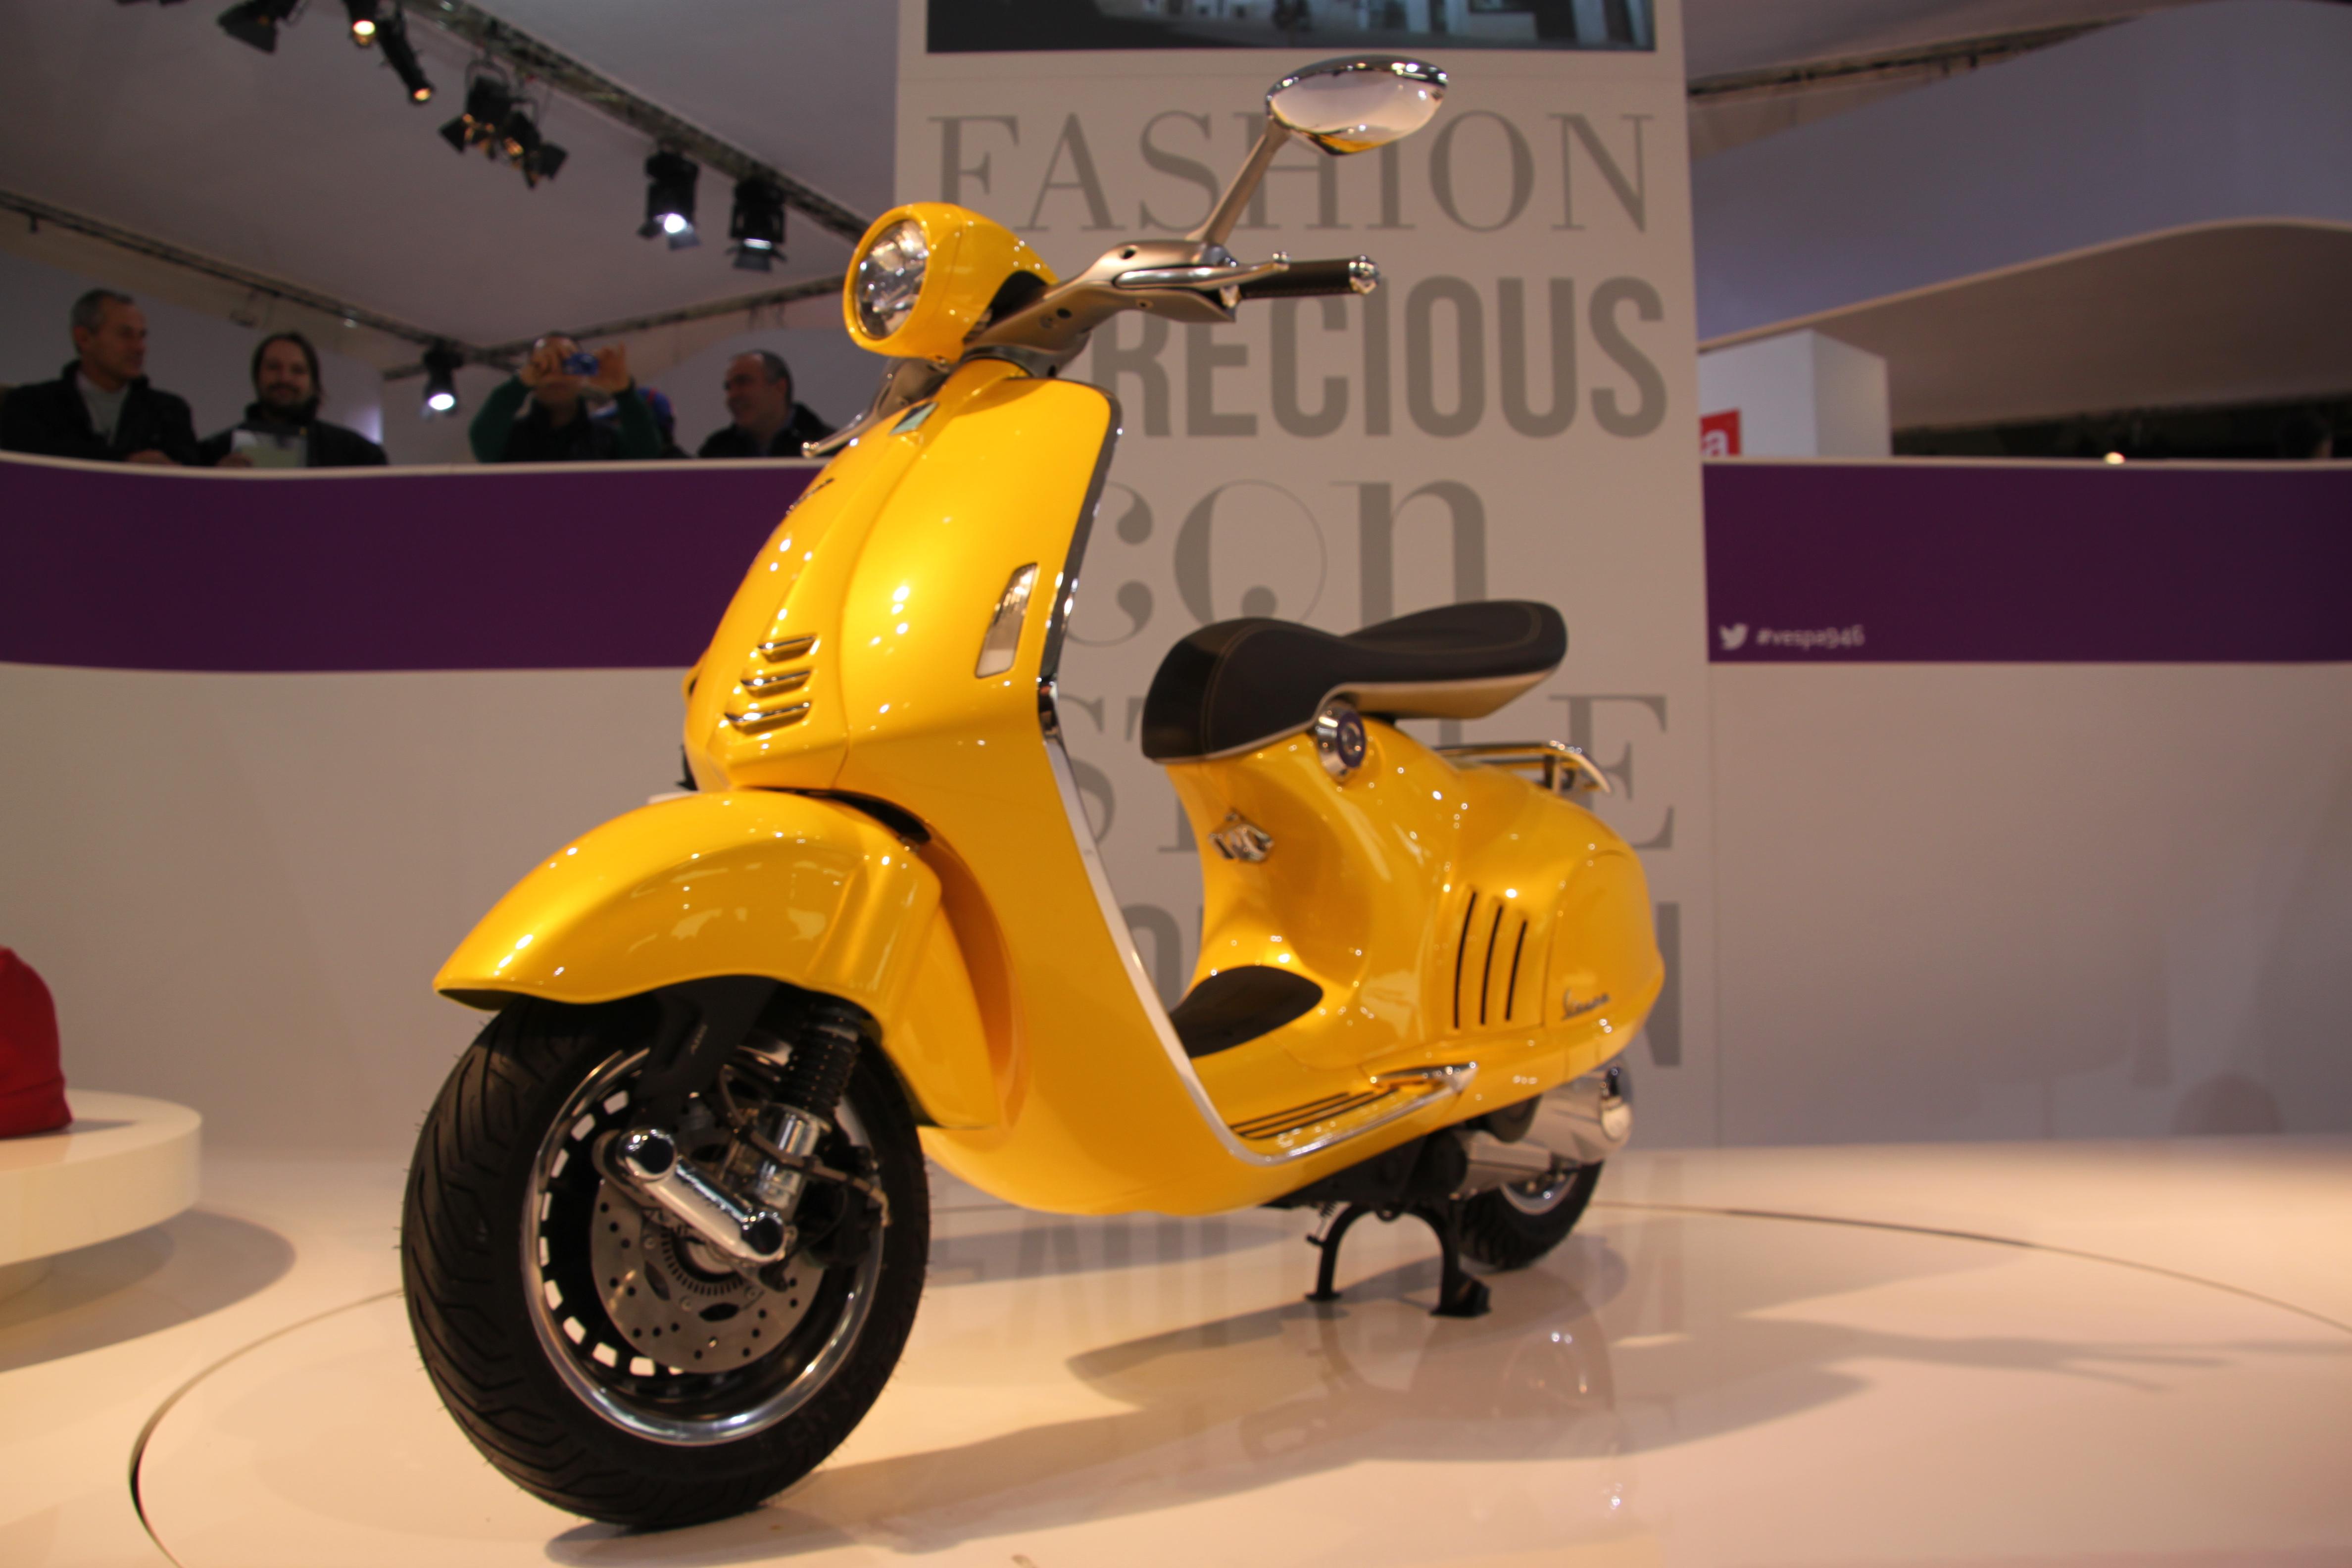 Vespa Yellow Scooty